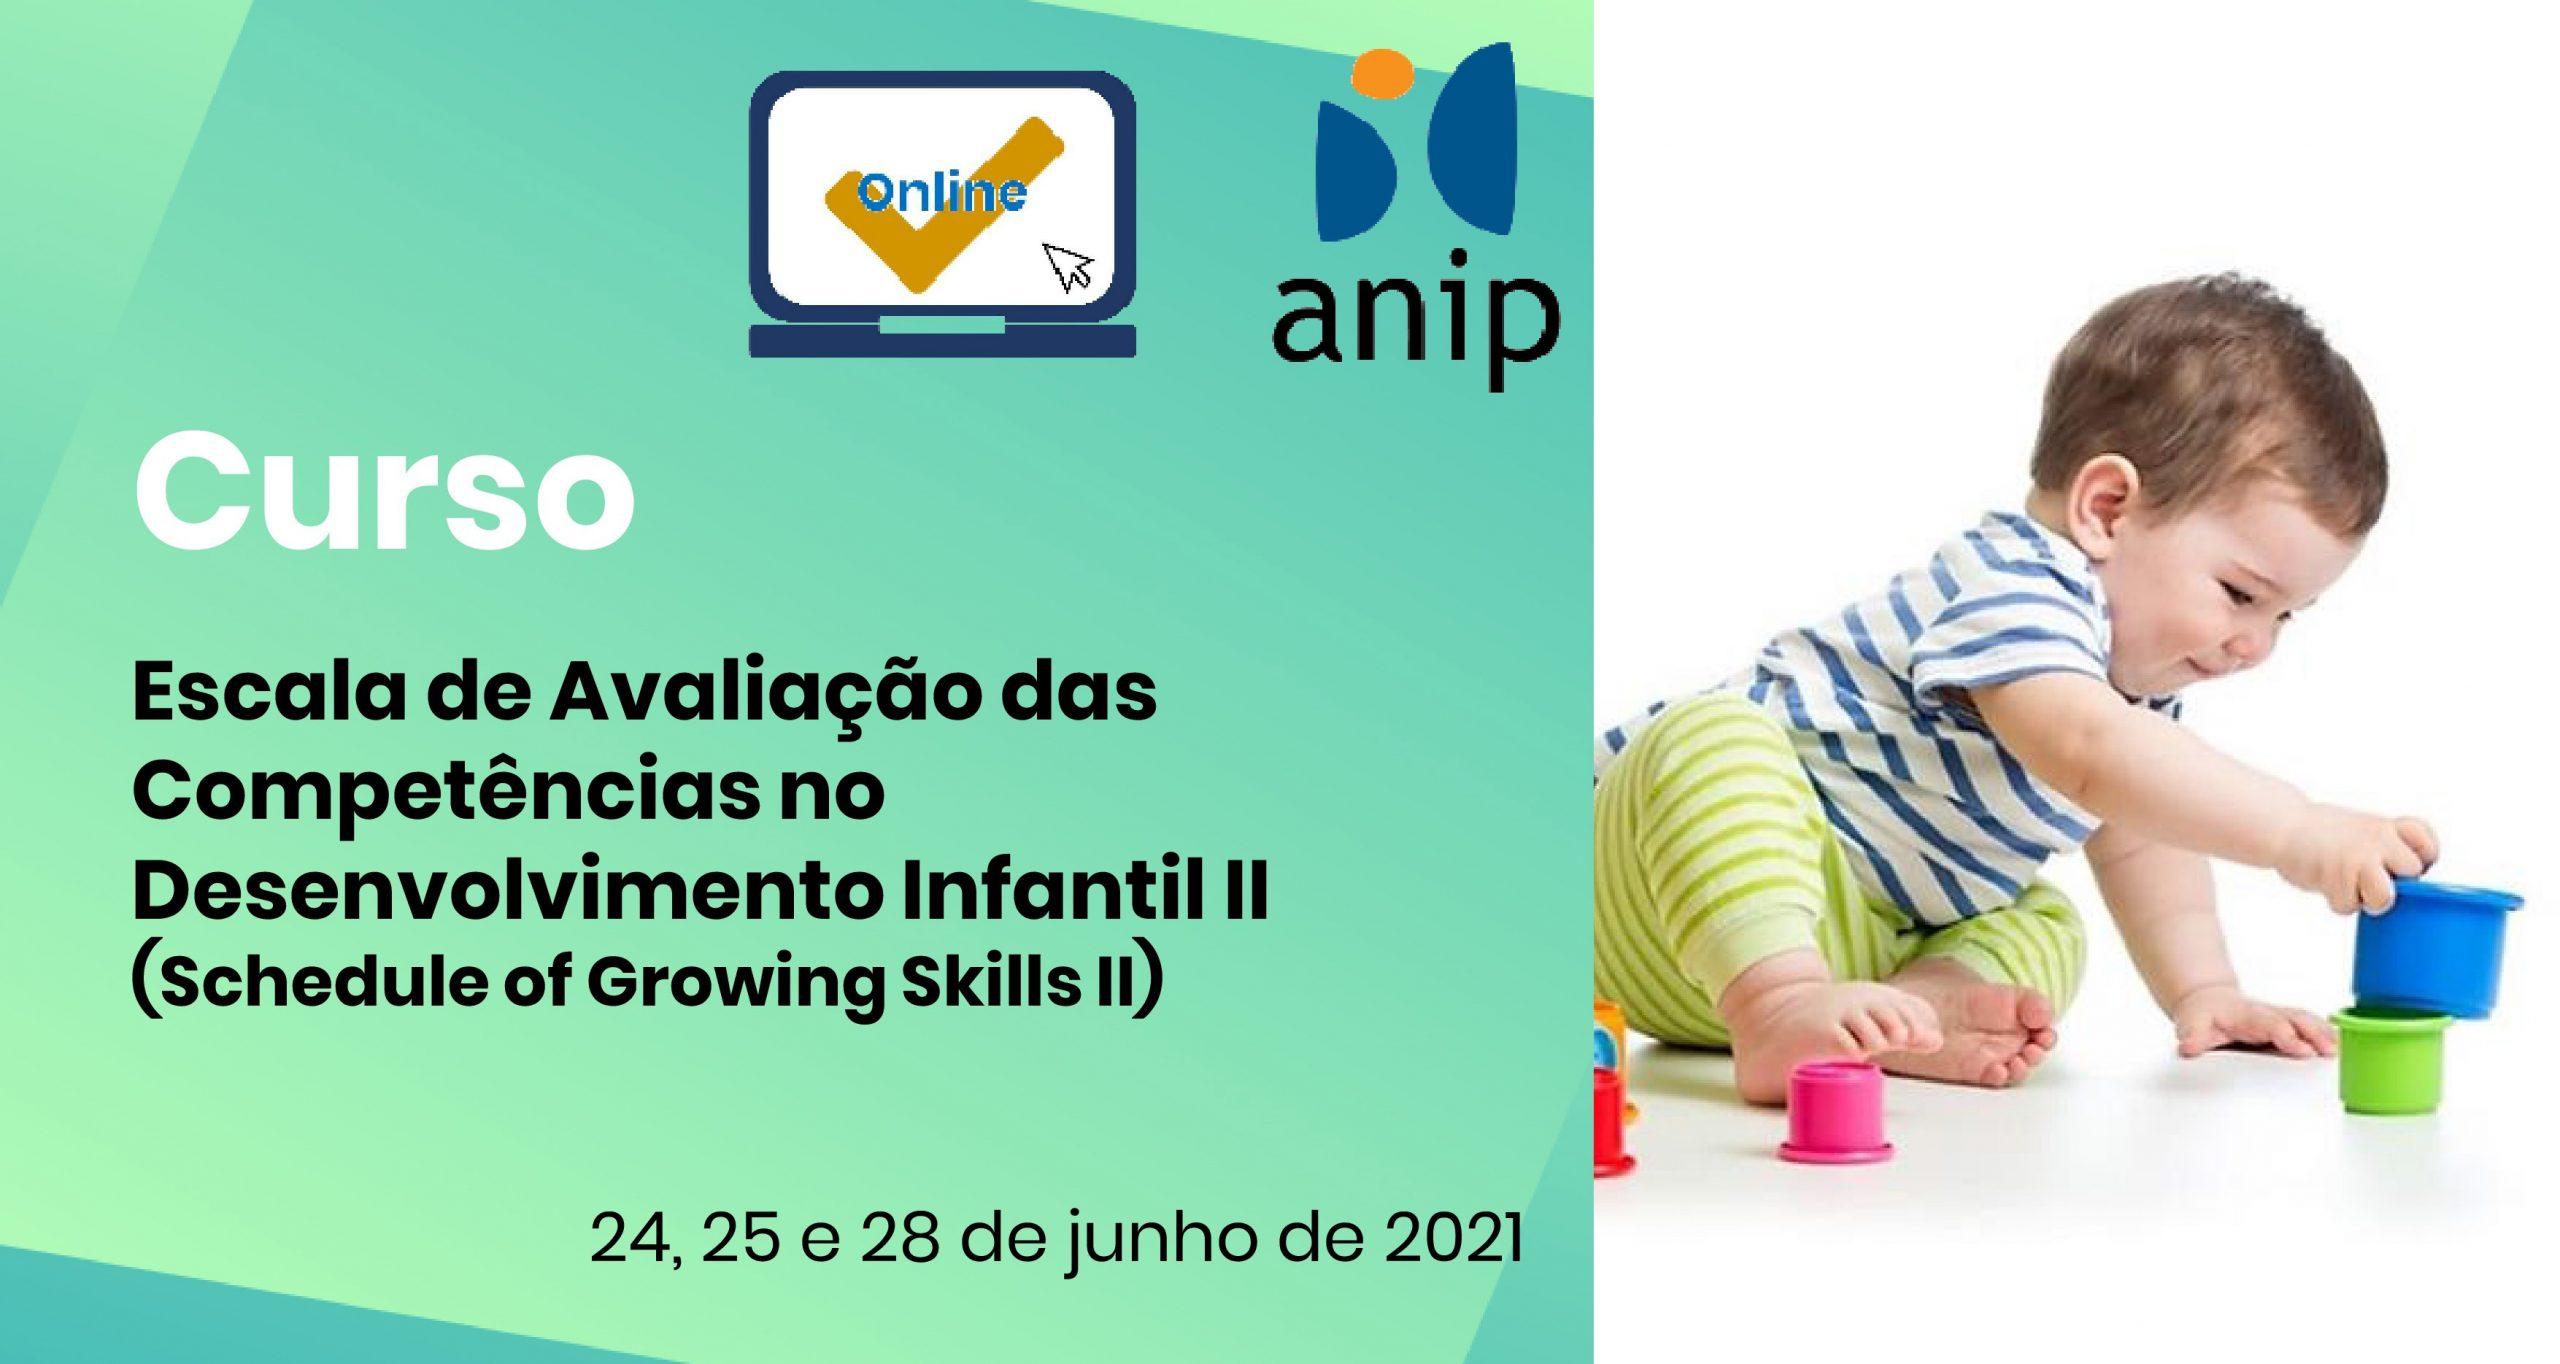 Escala de Avaliação Schedule of Growing Skills II (online)